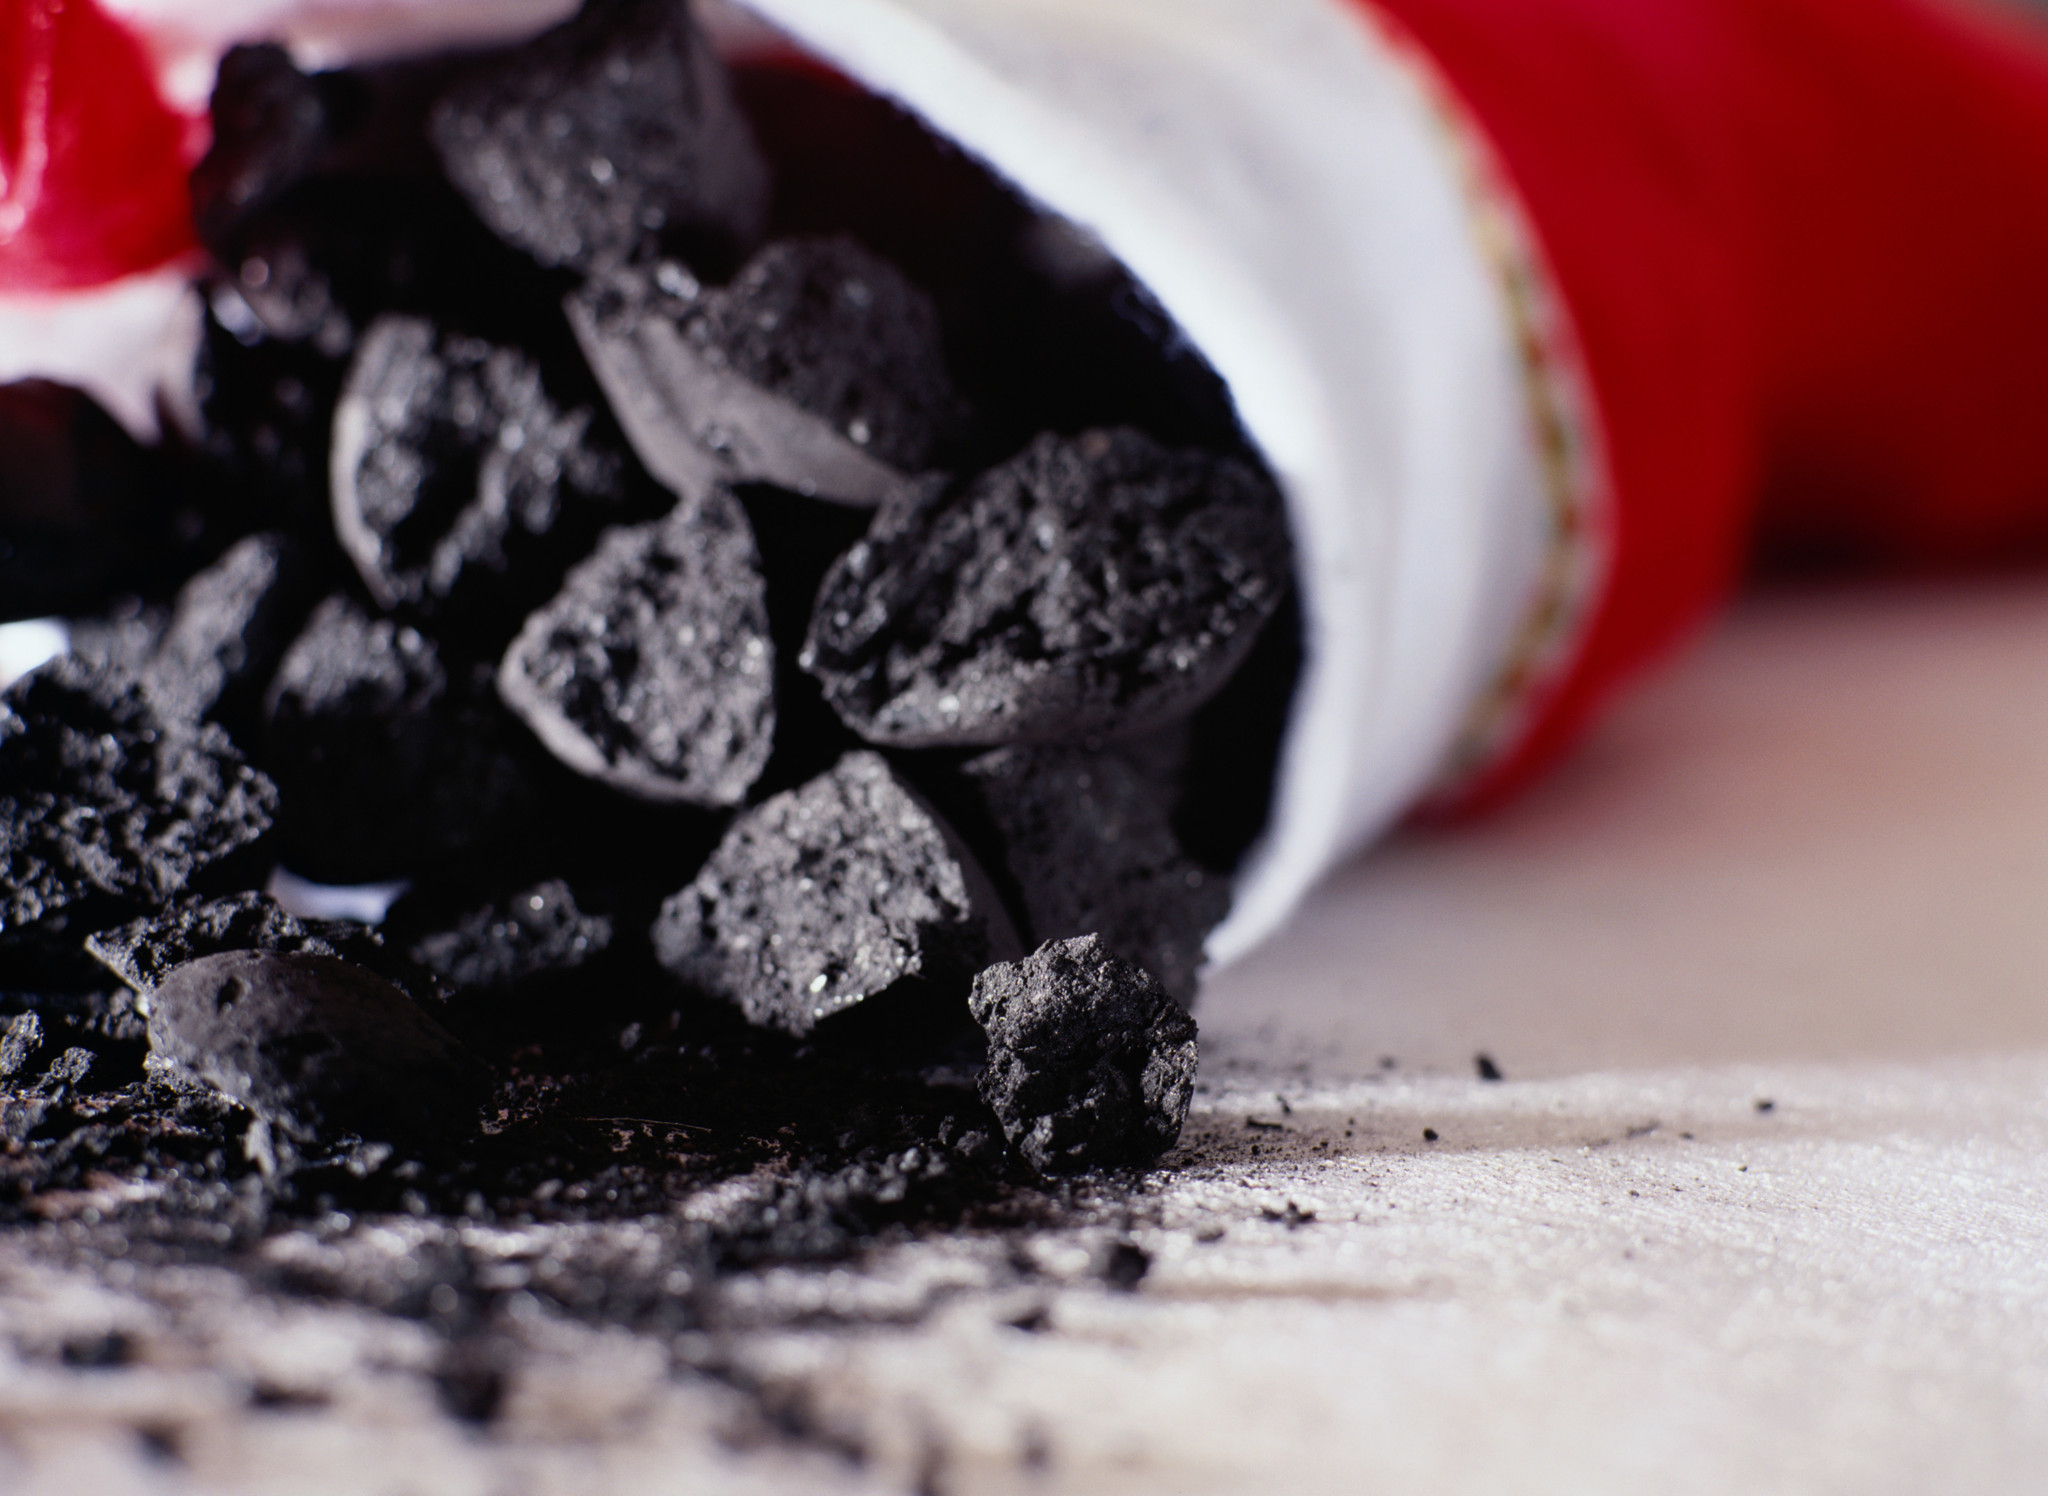 hc-op-thorson-coal-in-stocking-1224-2015